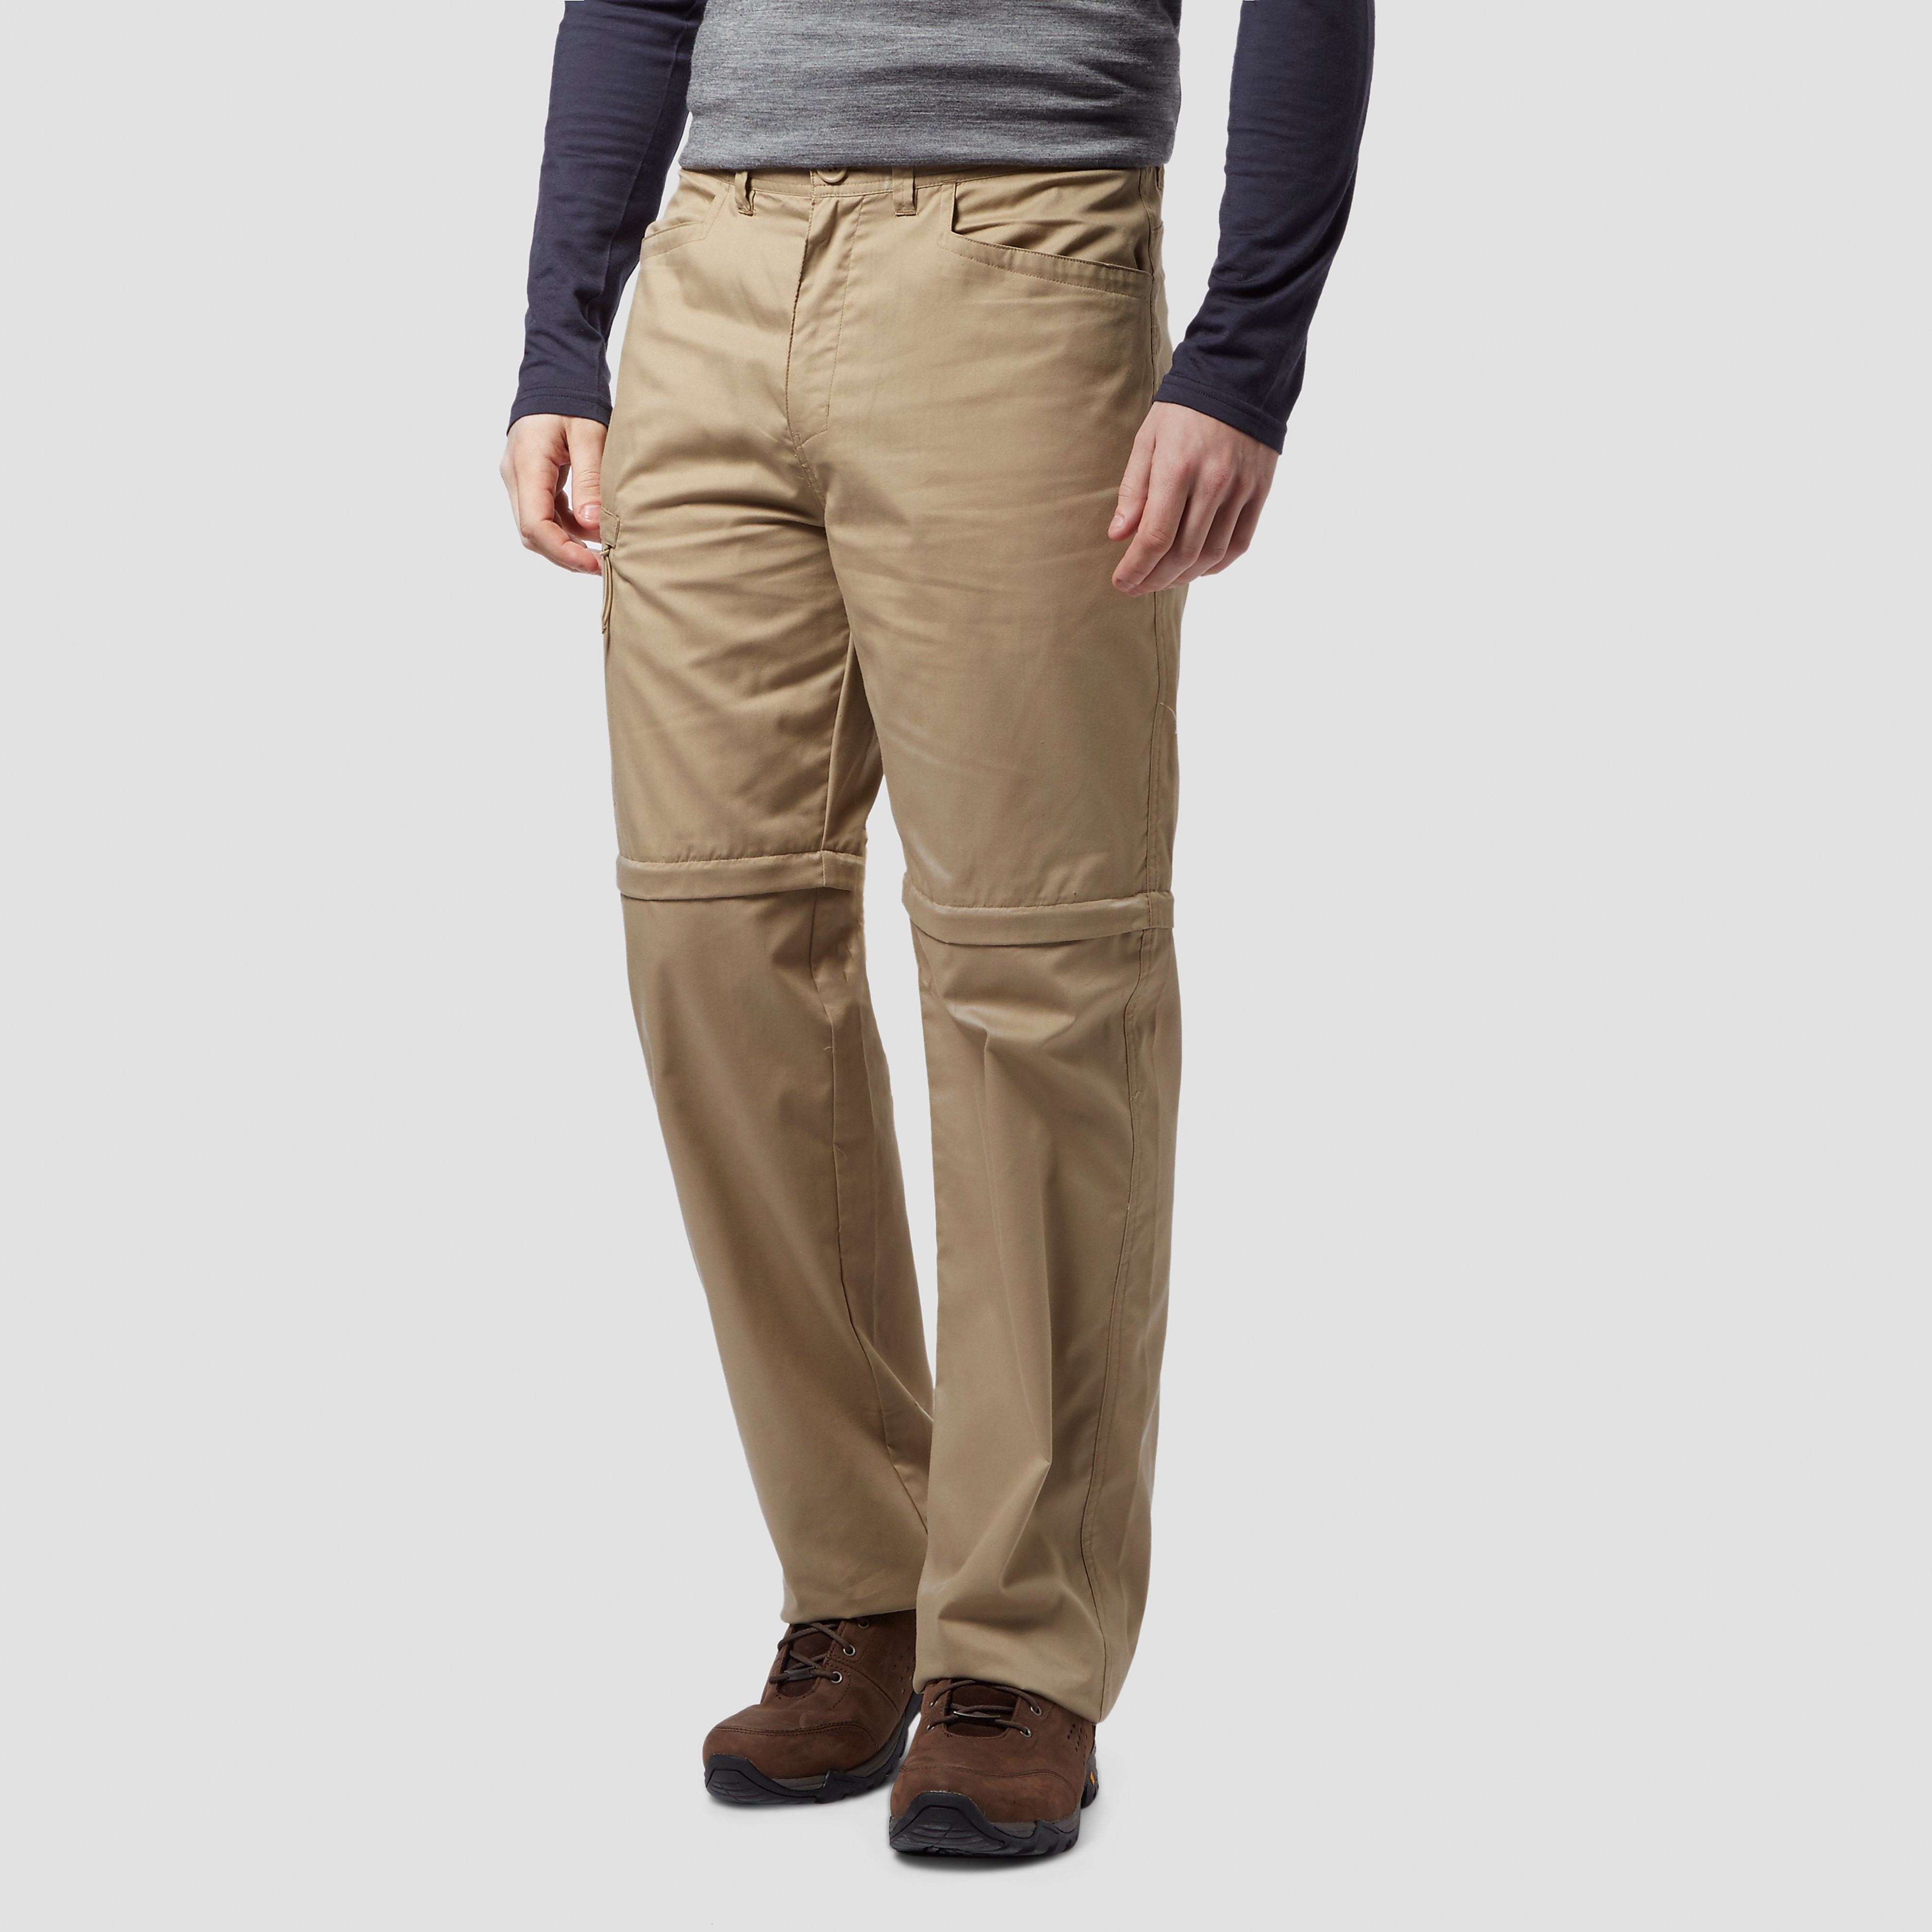 Peter Storm Men's Ramble Convertible Long Trousers